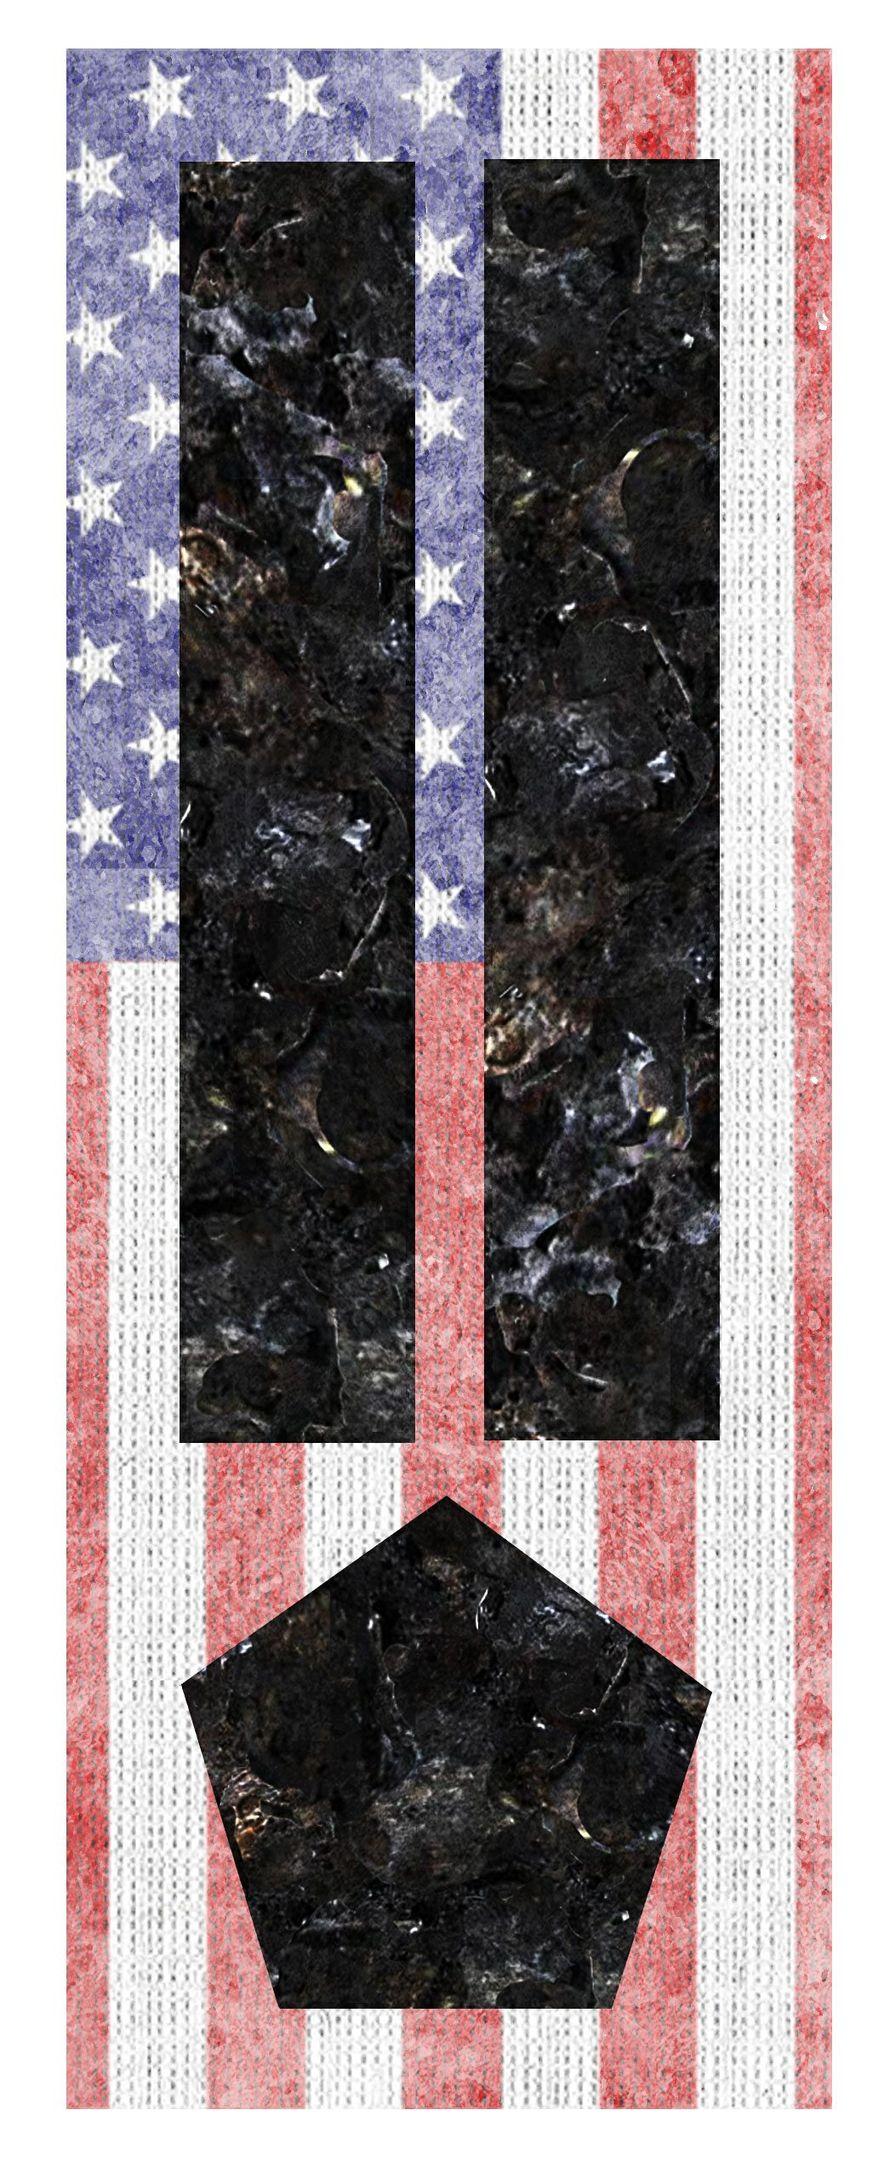 Illustration on 911 by Alexander Hunter/The Washington Times